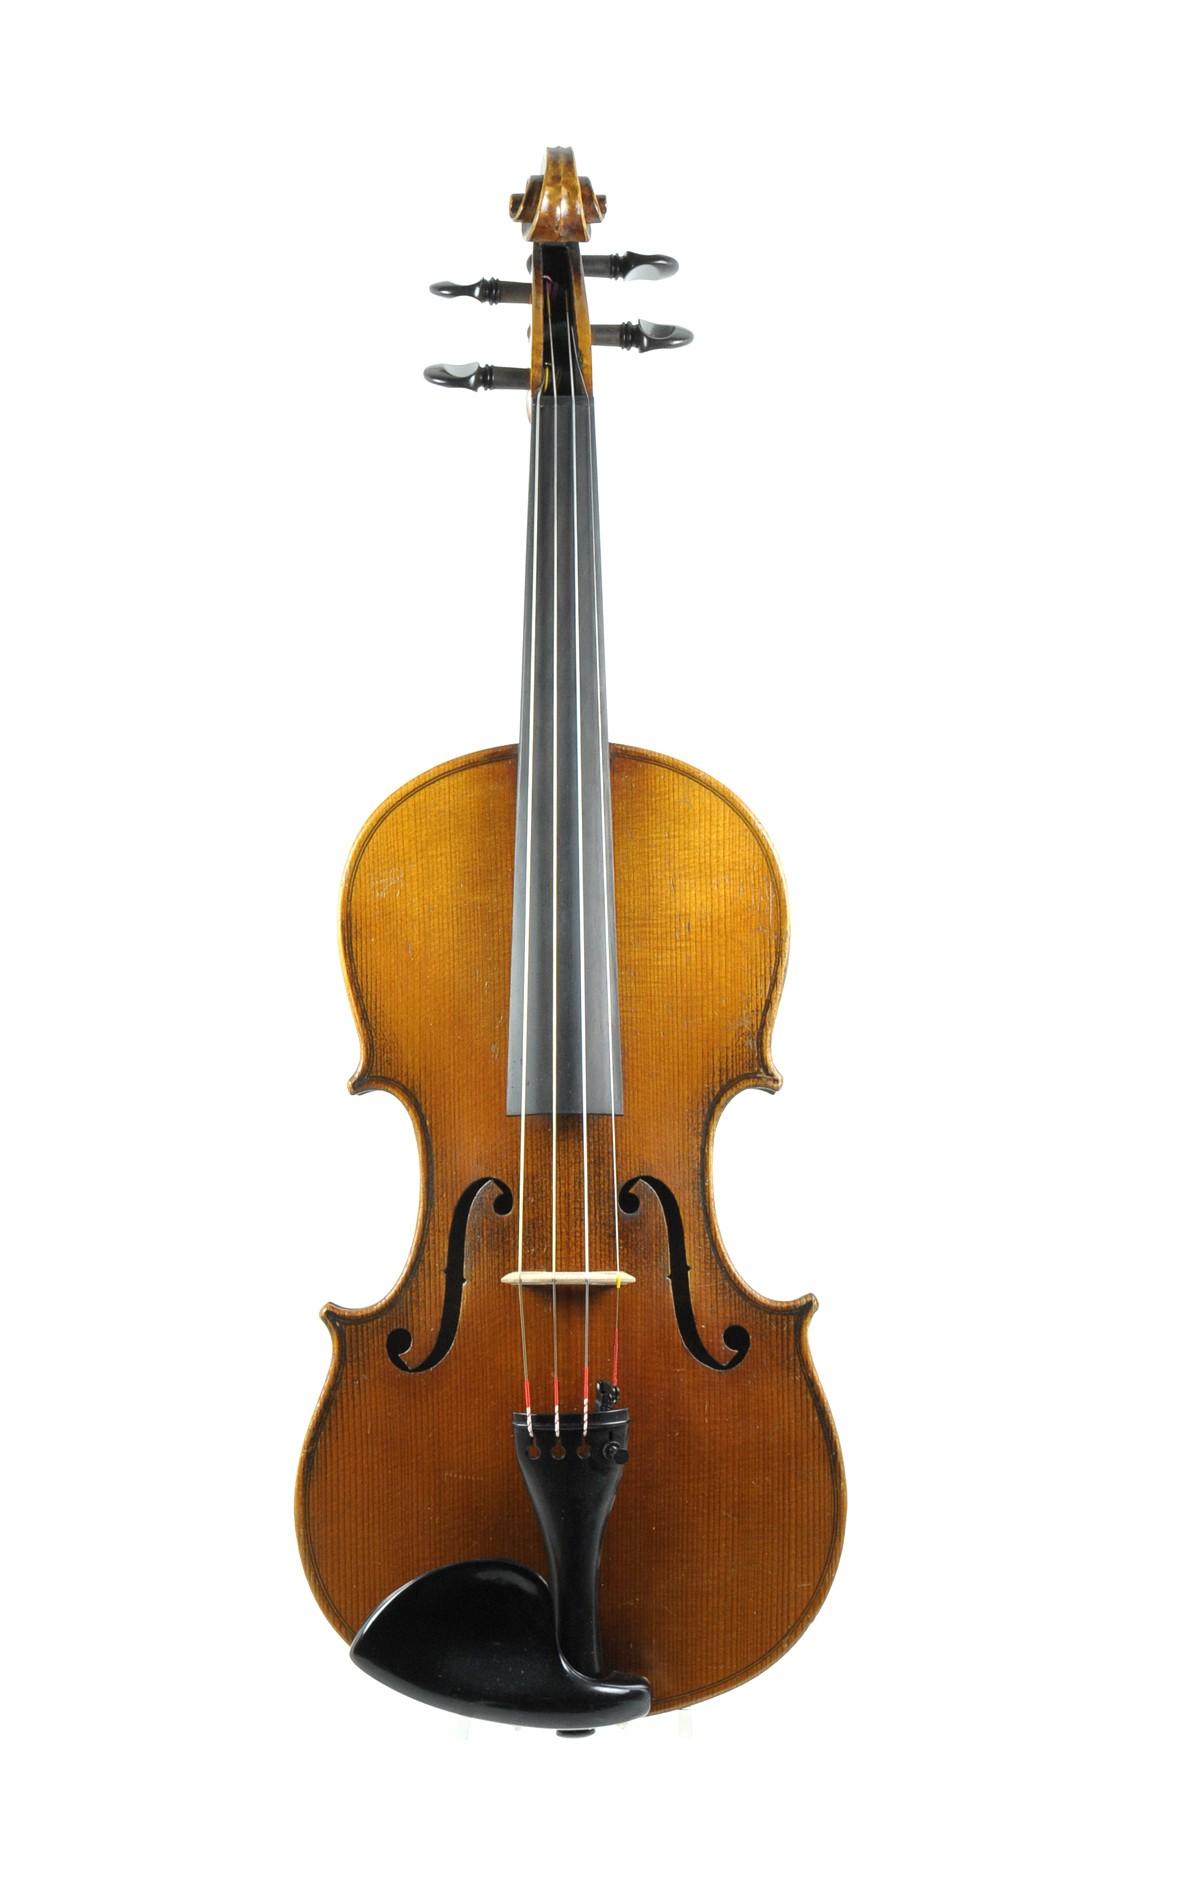 3/4 - good Markneukirchen violin, prob. Schuster & Co. - top view